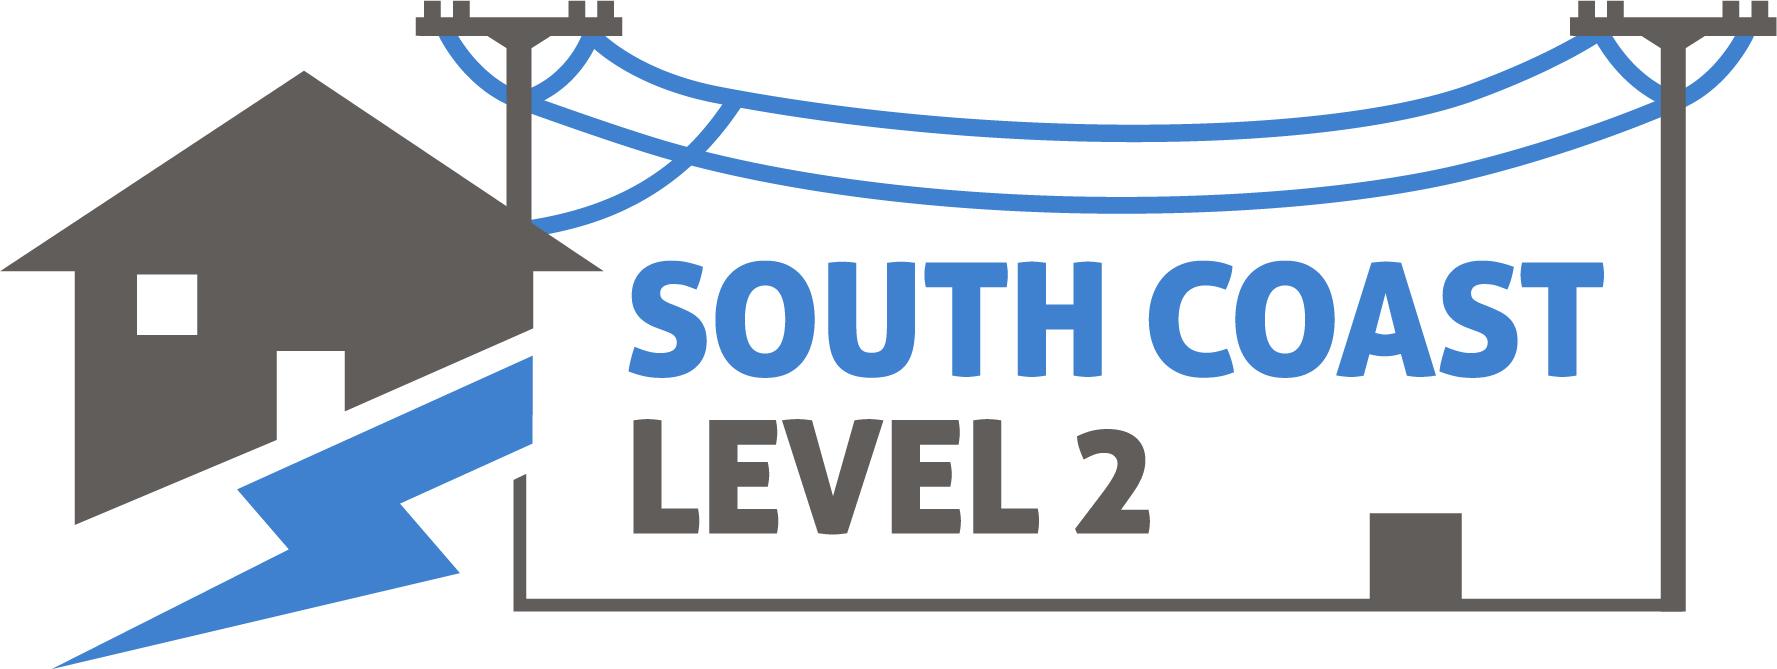 South Coast Level 2 Logo